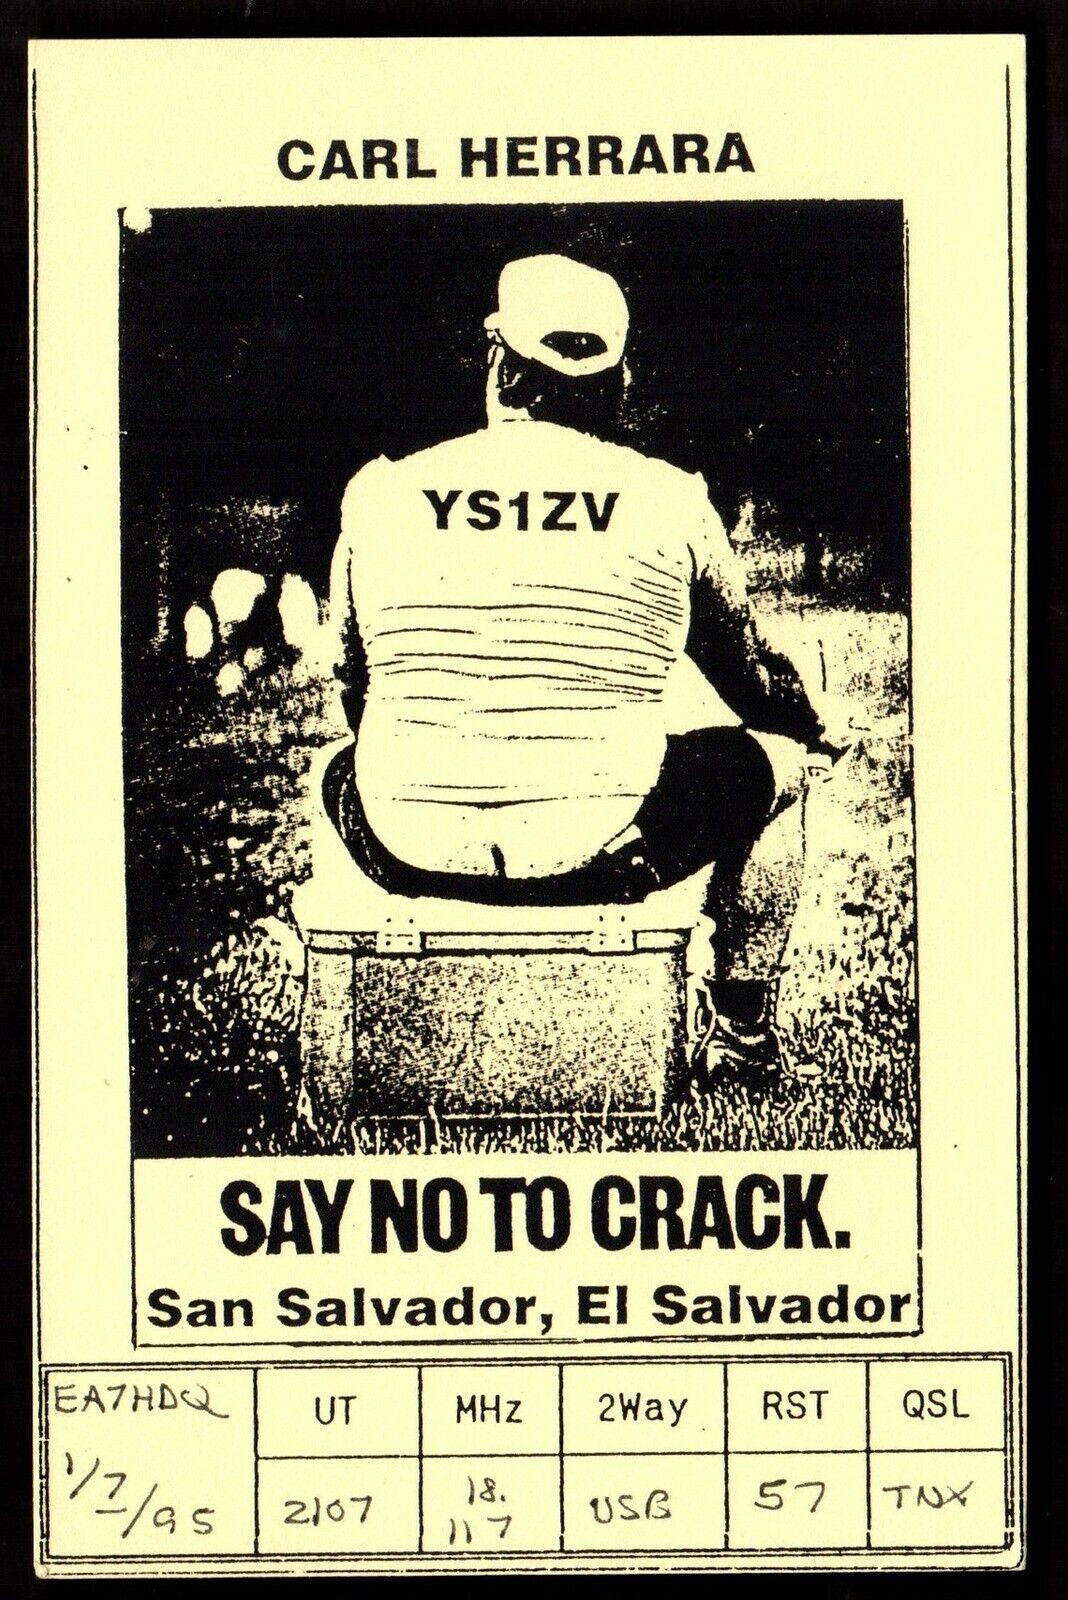 QSL QSO Radio Card Carl Herrara,Say No To Crack,YS1ZV, El Salvador (Q3425)